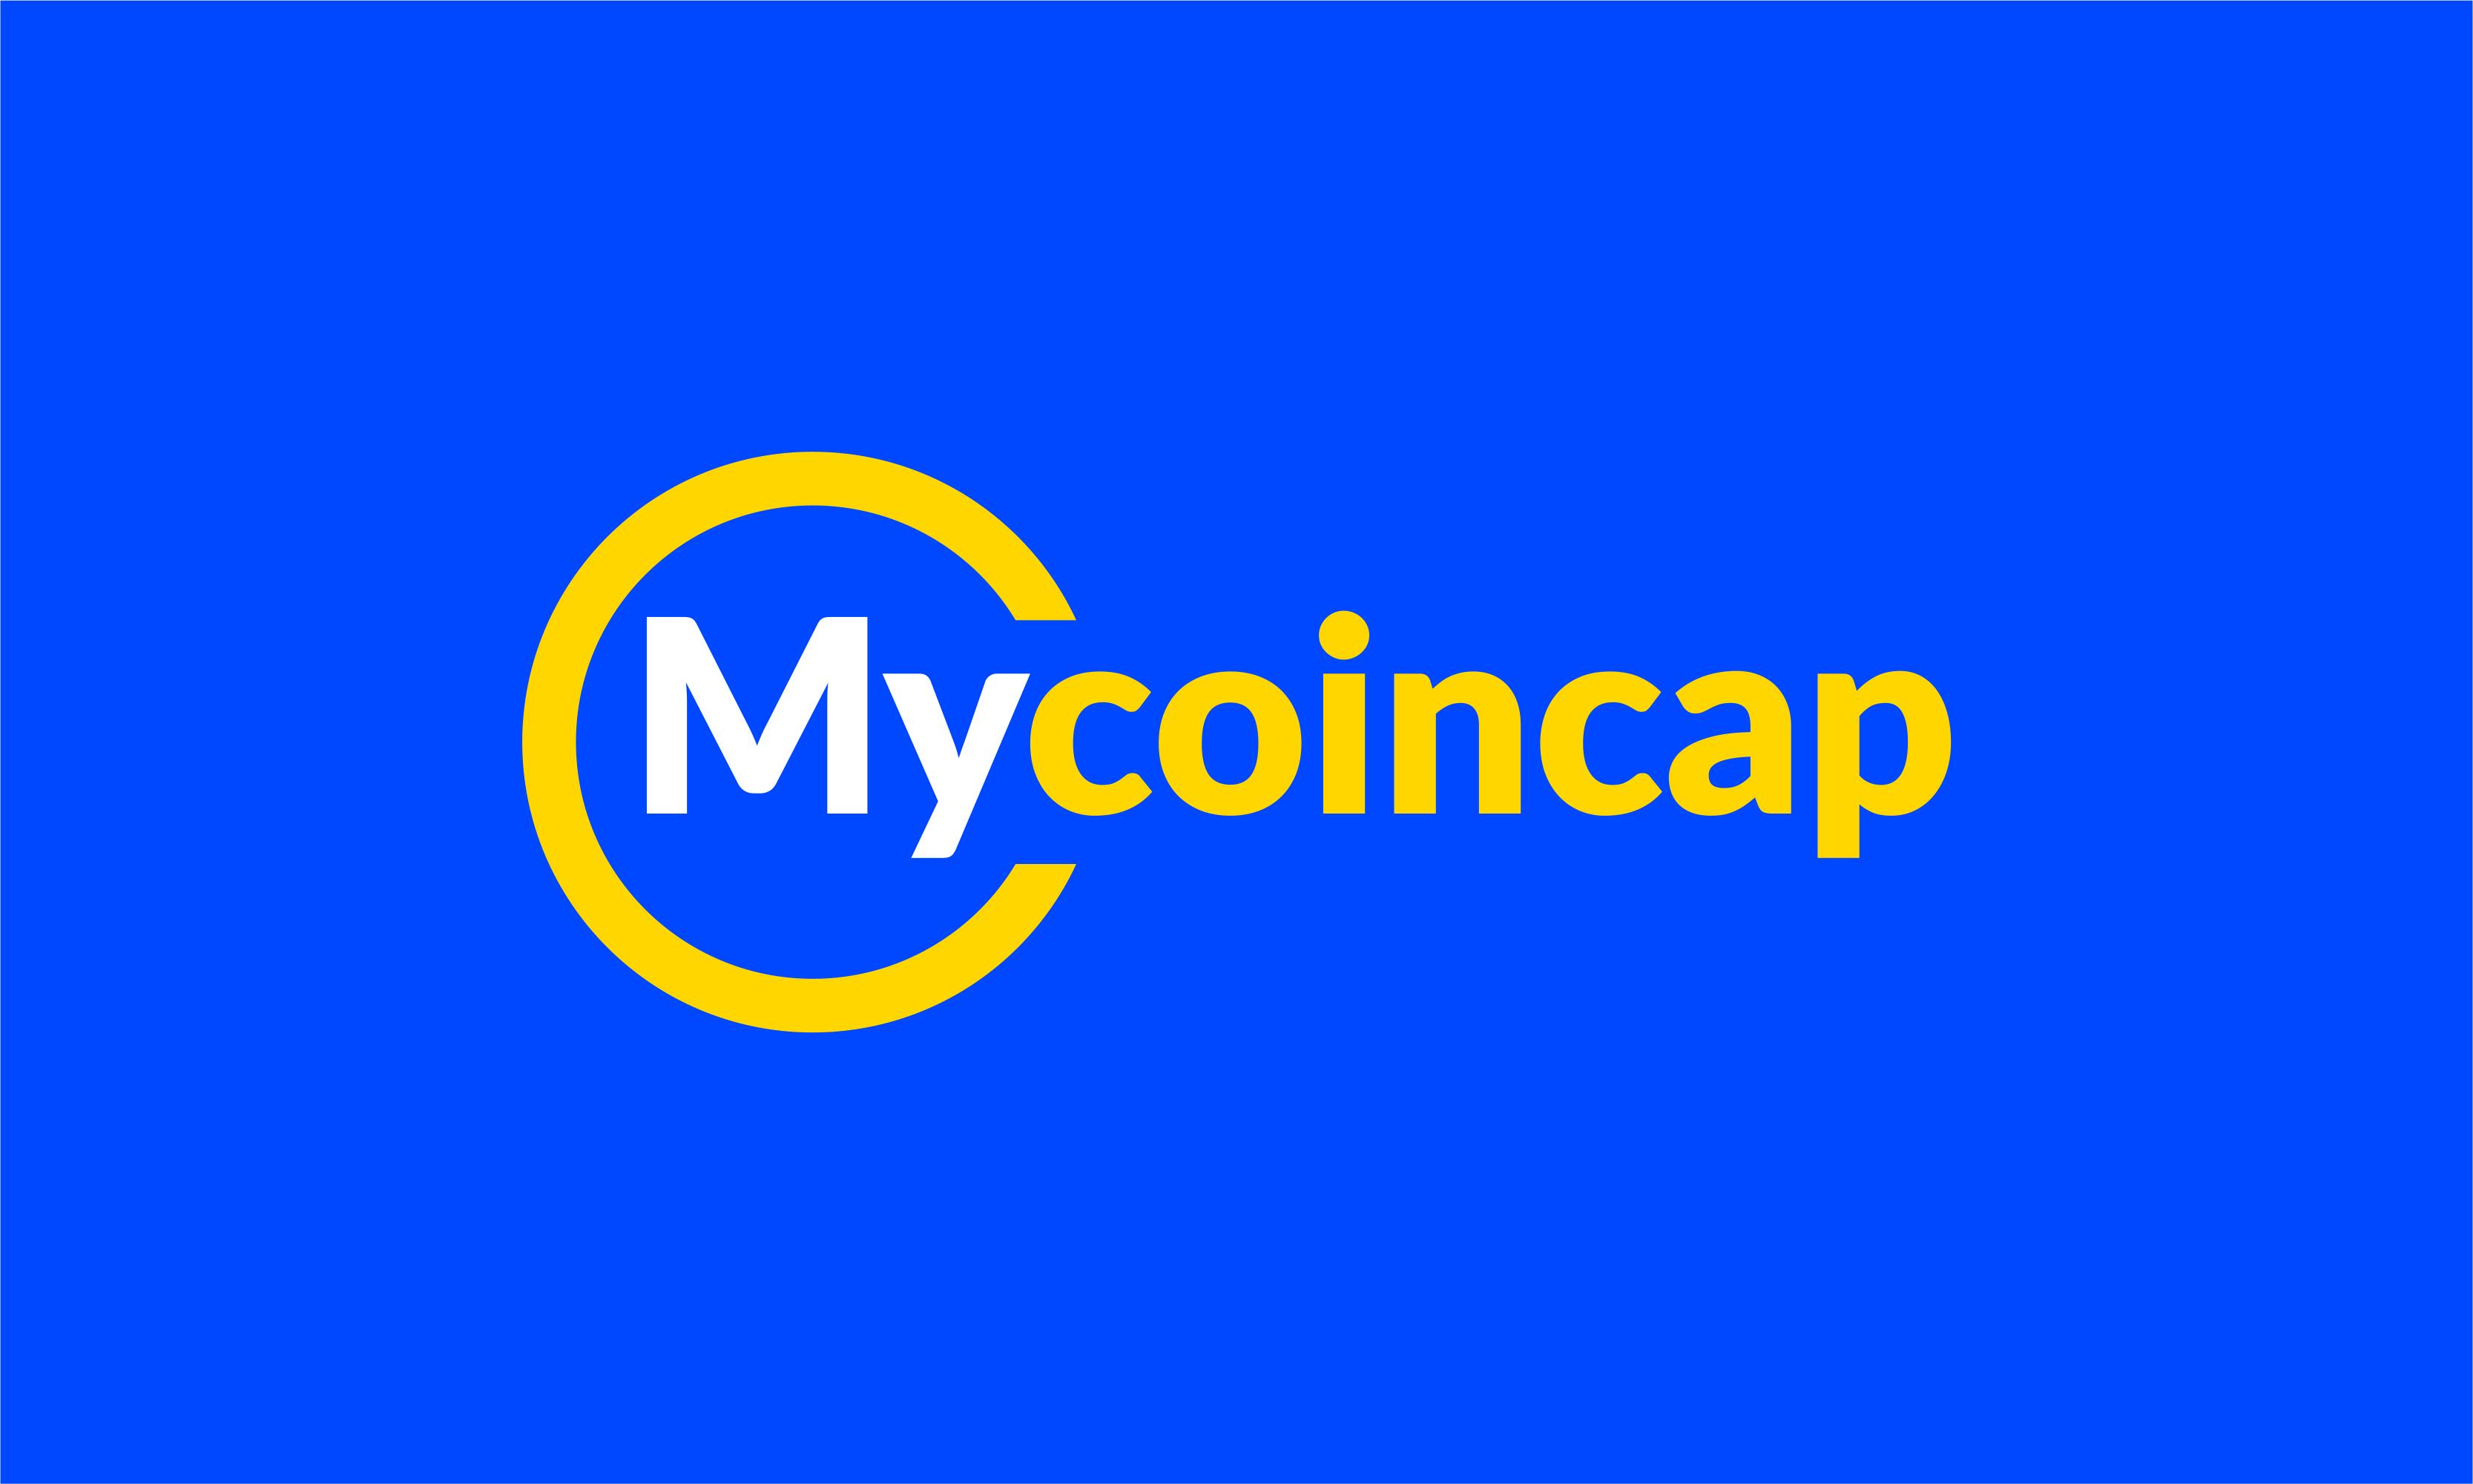 Mycoincap